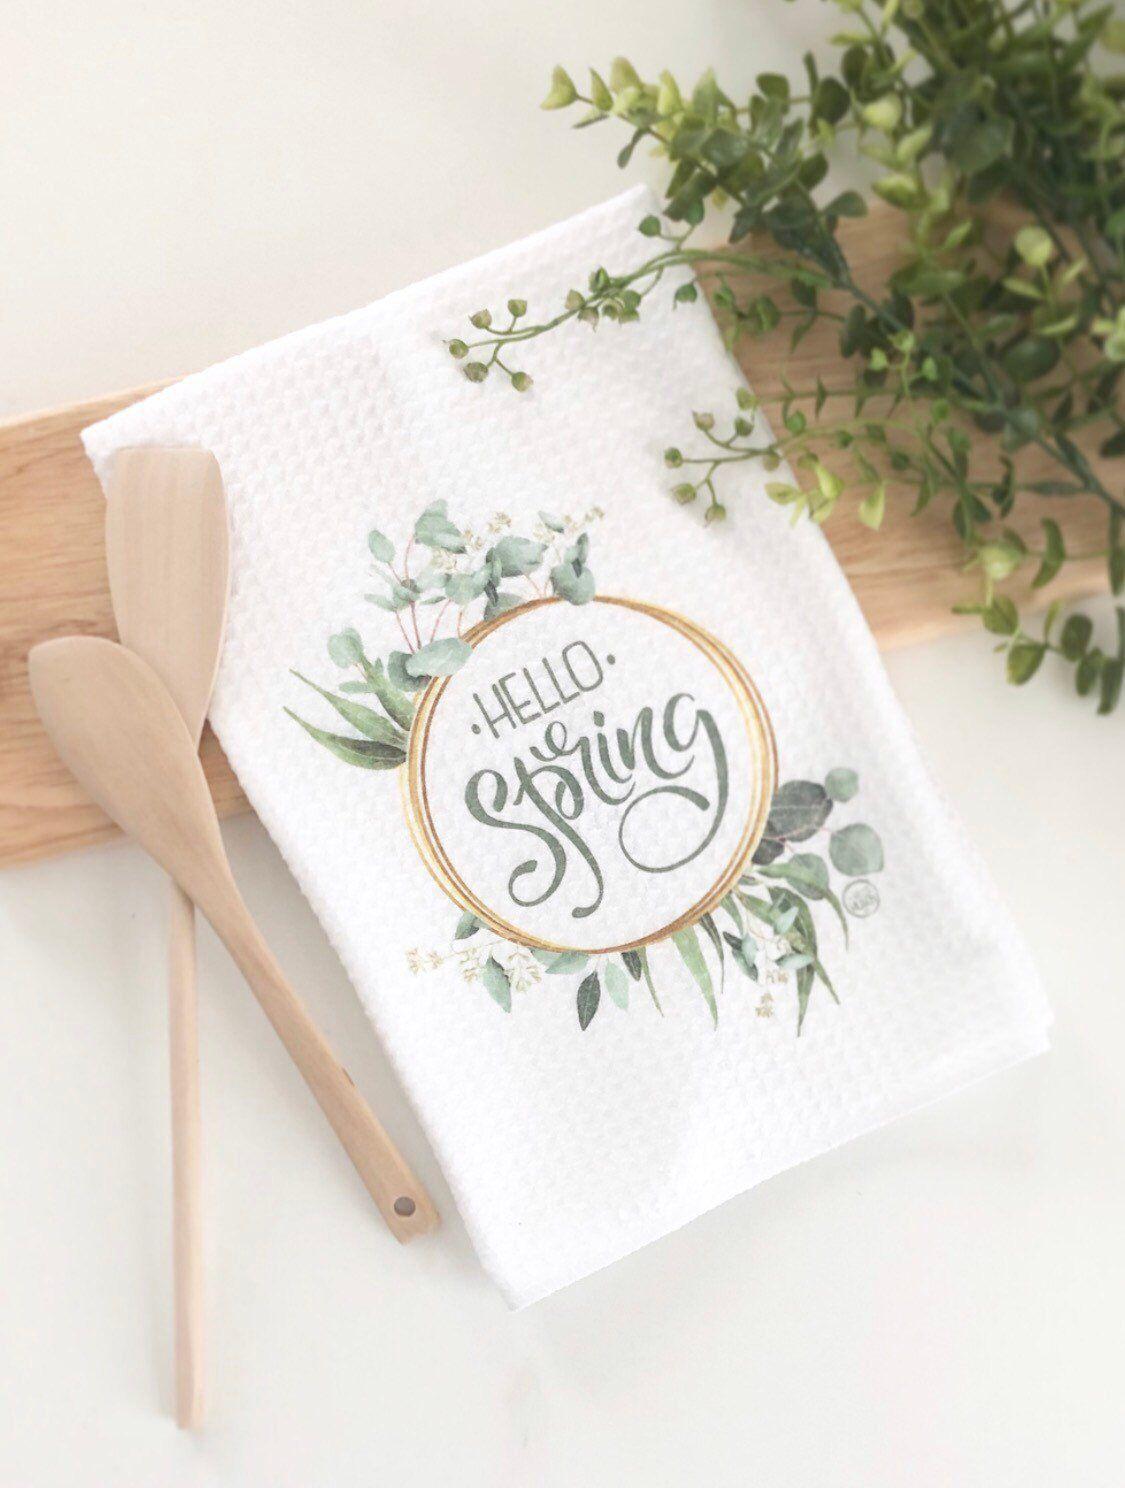 Hello Spring Tea Towel Spring Kitchen Decor Watercolor Tea Towel